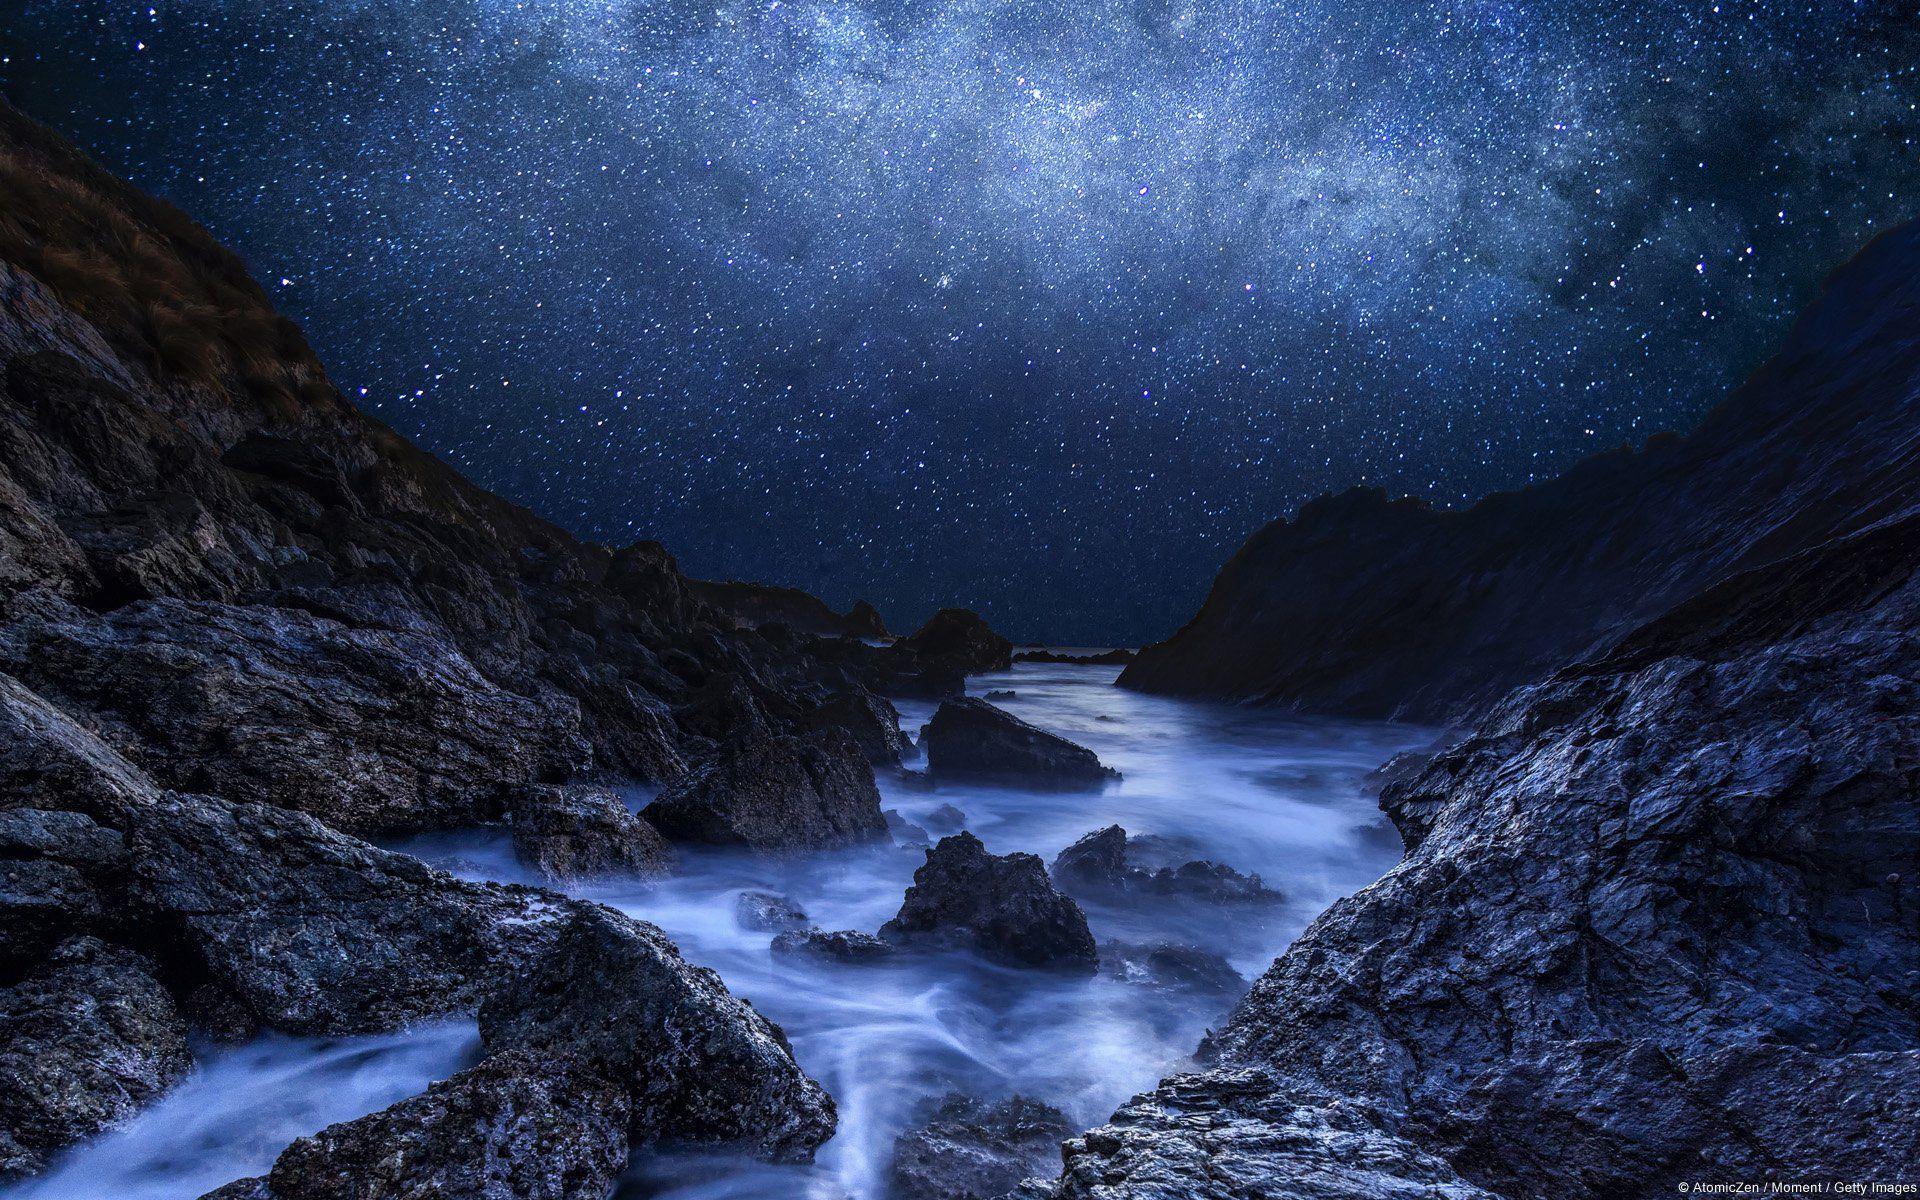 Top 10 Microsoft Resellers In Singapore Starry Night Wallpaper Wallpaper Nature